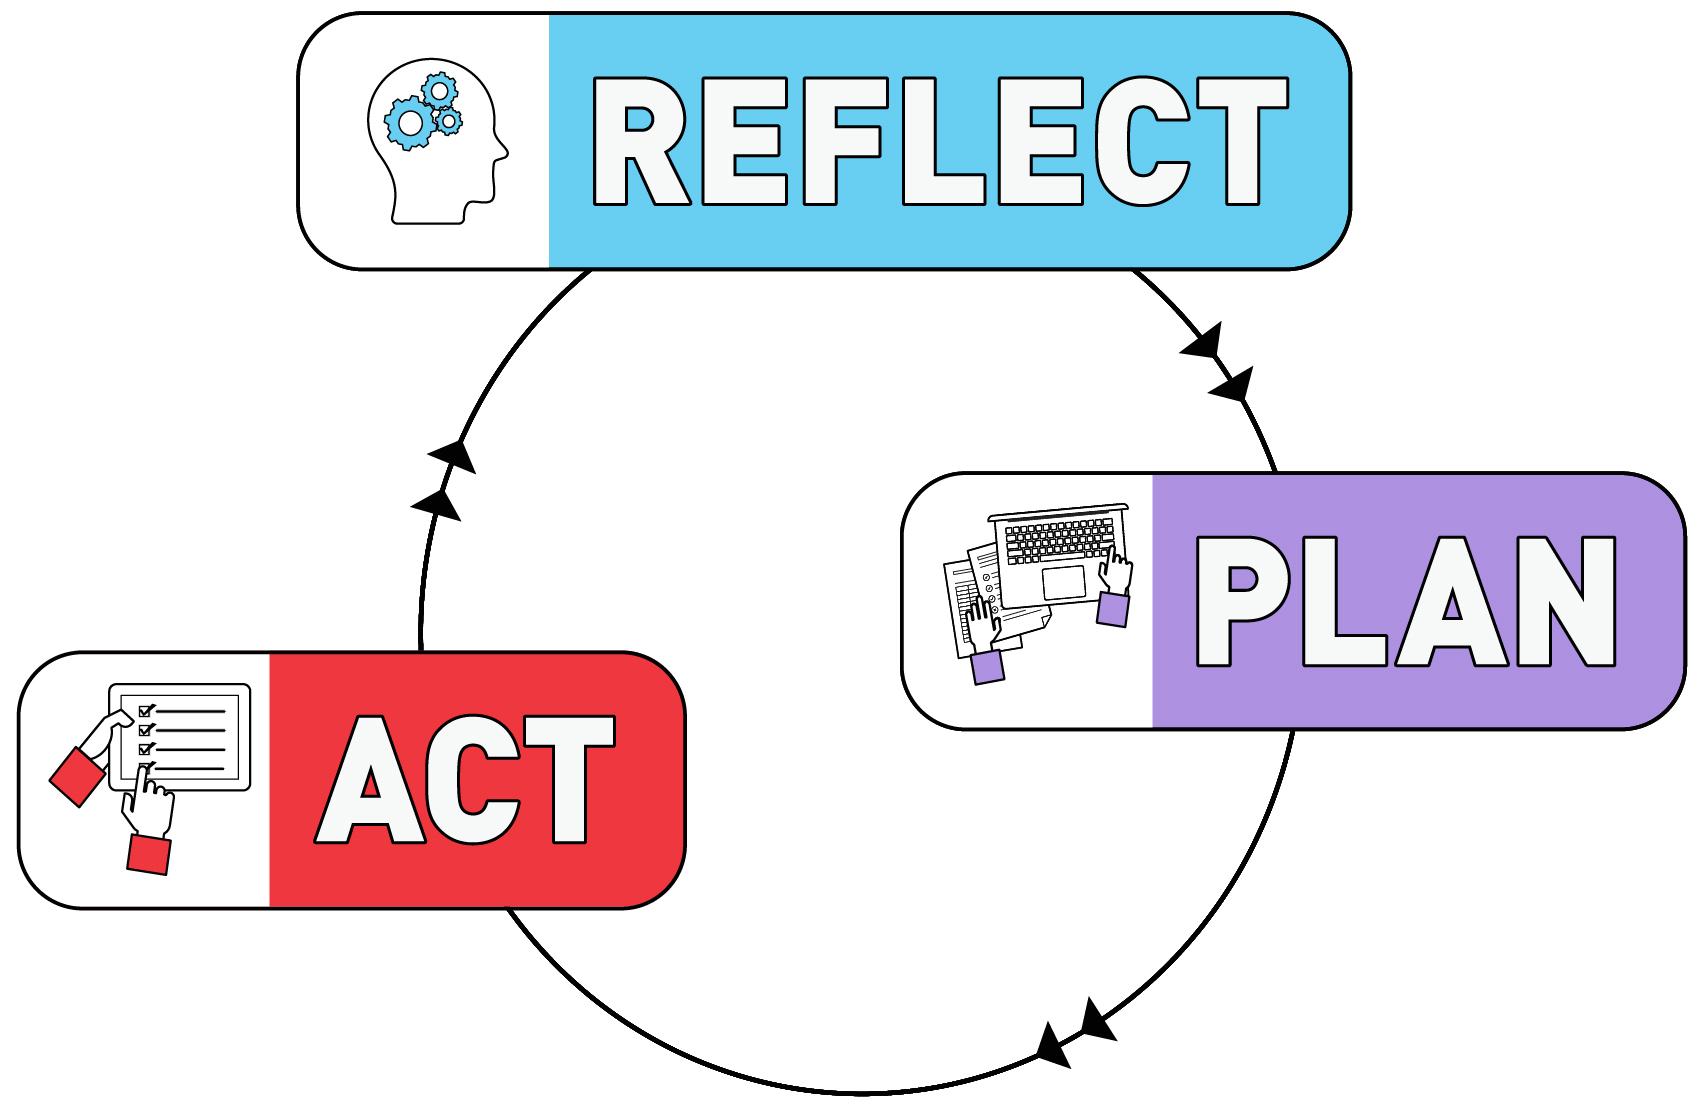 reflect-plan-act.jpg